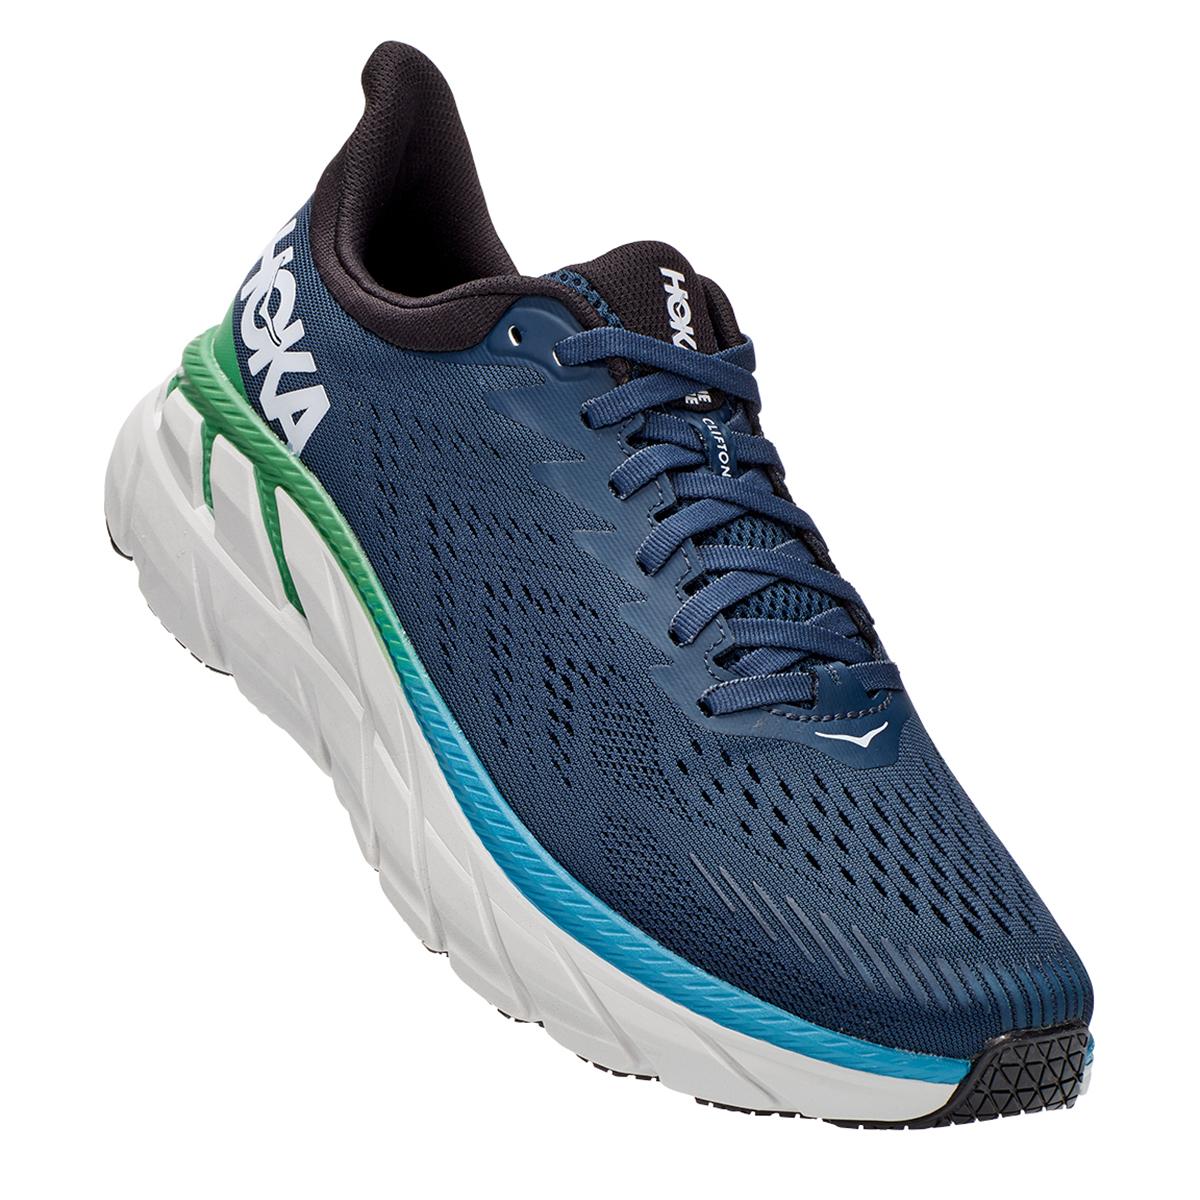 Men's Hoka One One Clifton 7 Running Shoe - Color: Moonlit Ocean/Anthracite - Size: 7 - Width: Regular, Moonlit Ocean/Anthracite, large, image 4